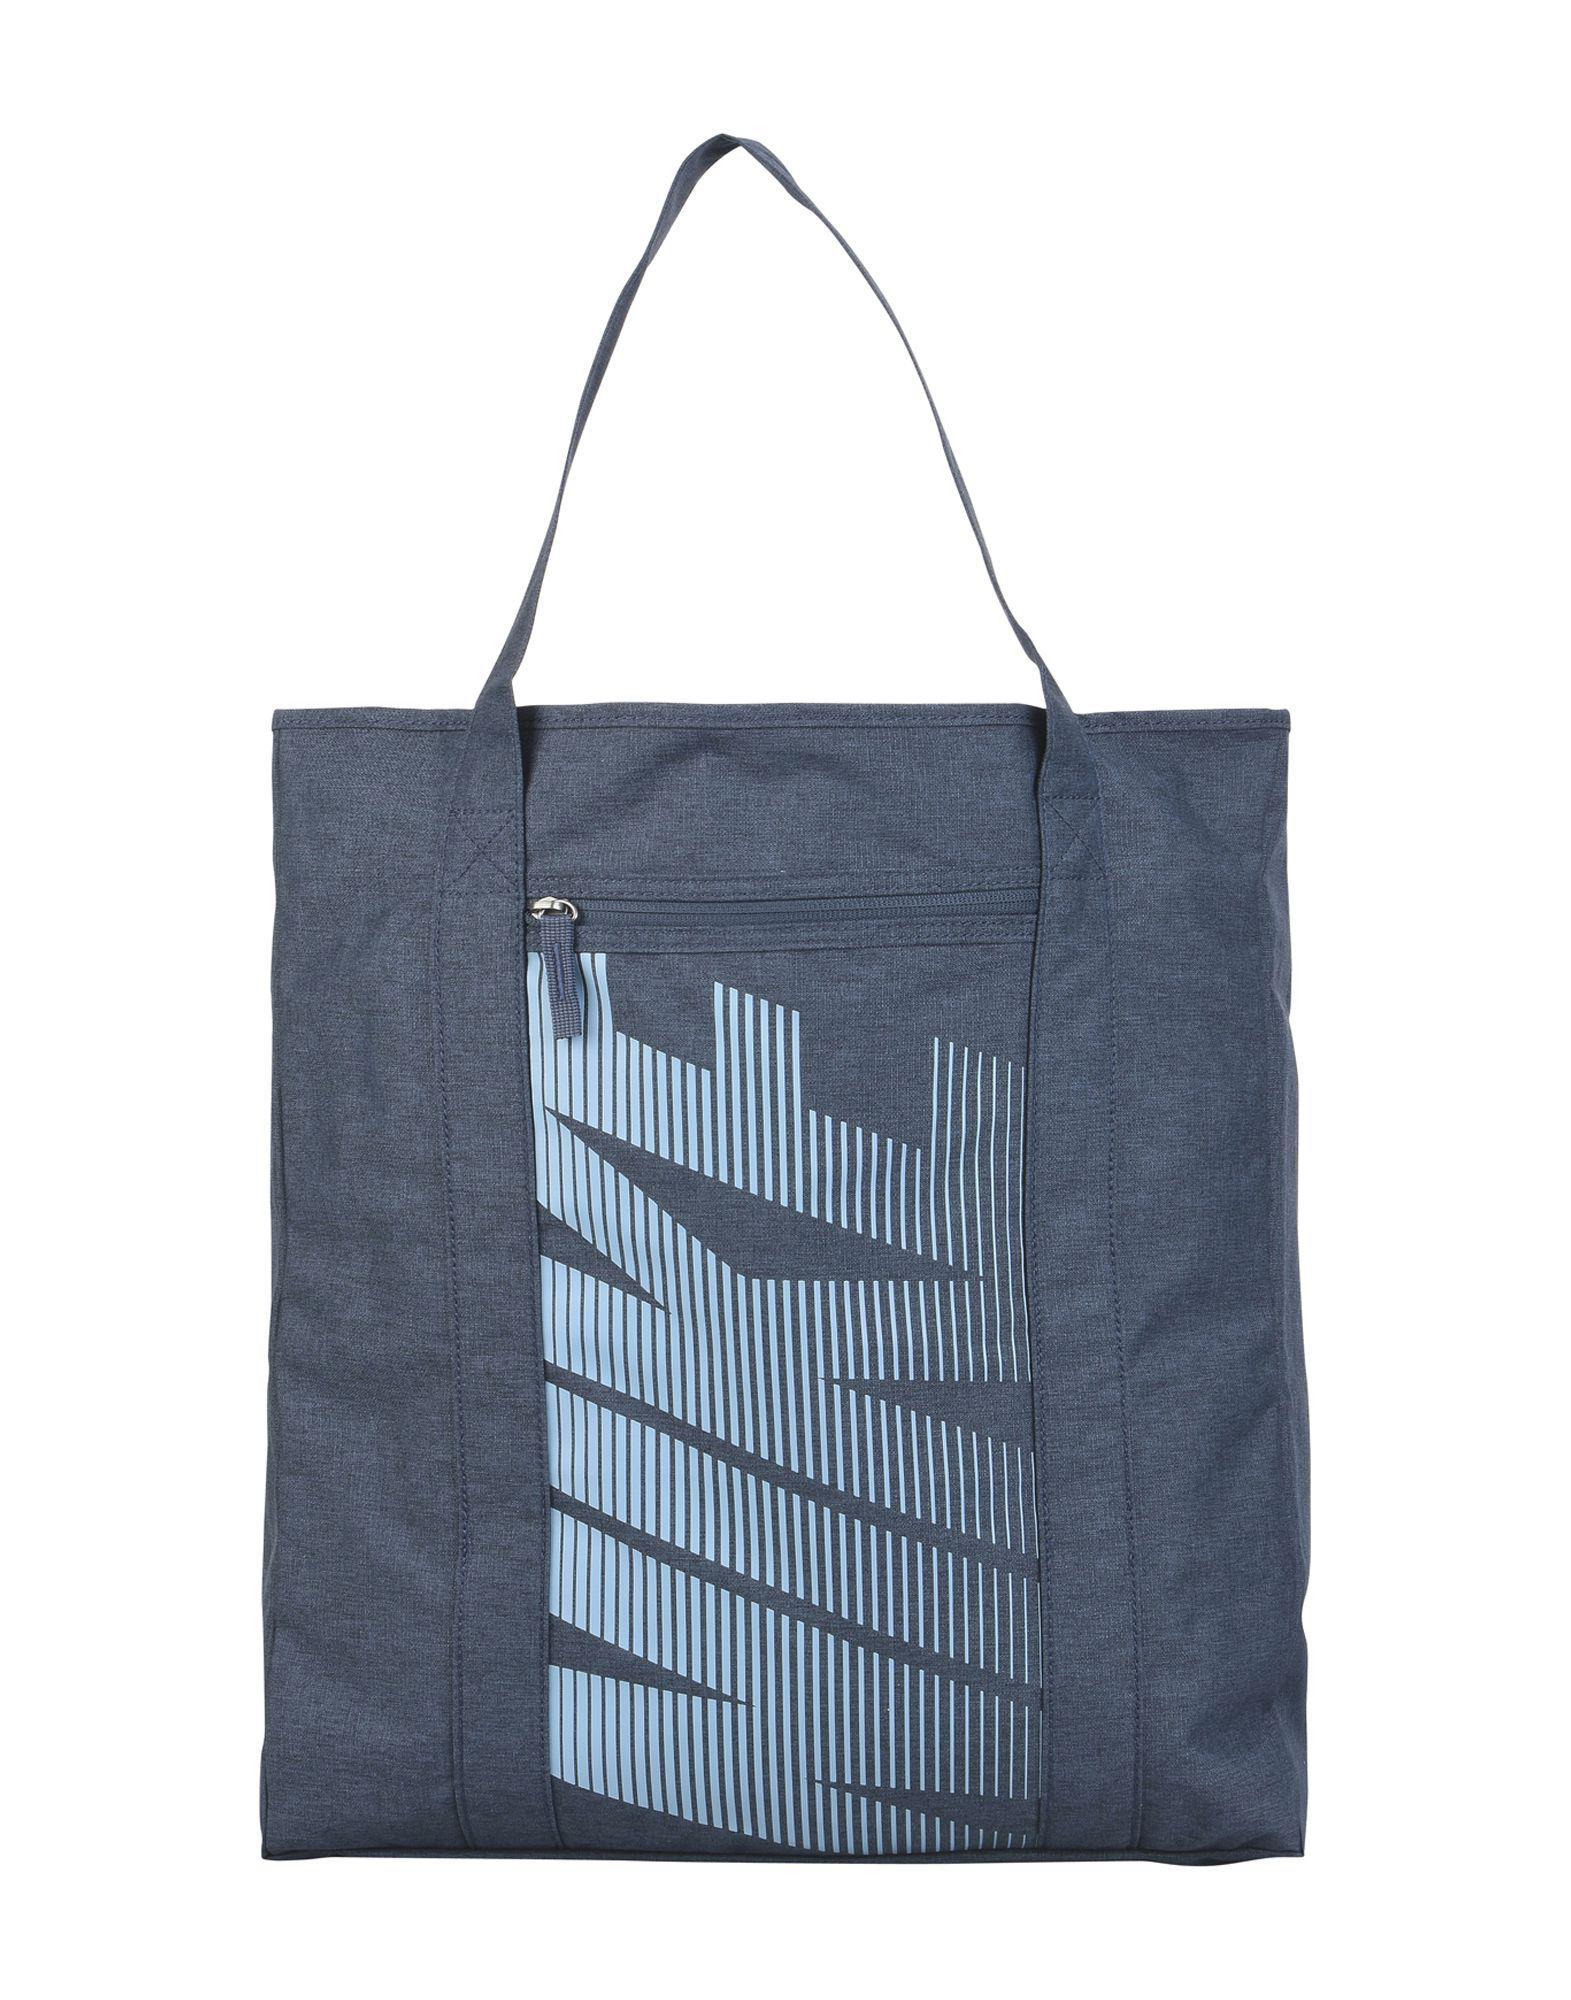 1f38d24069 Nike Handbag in Blue - Lyst